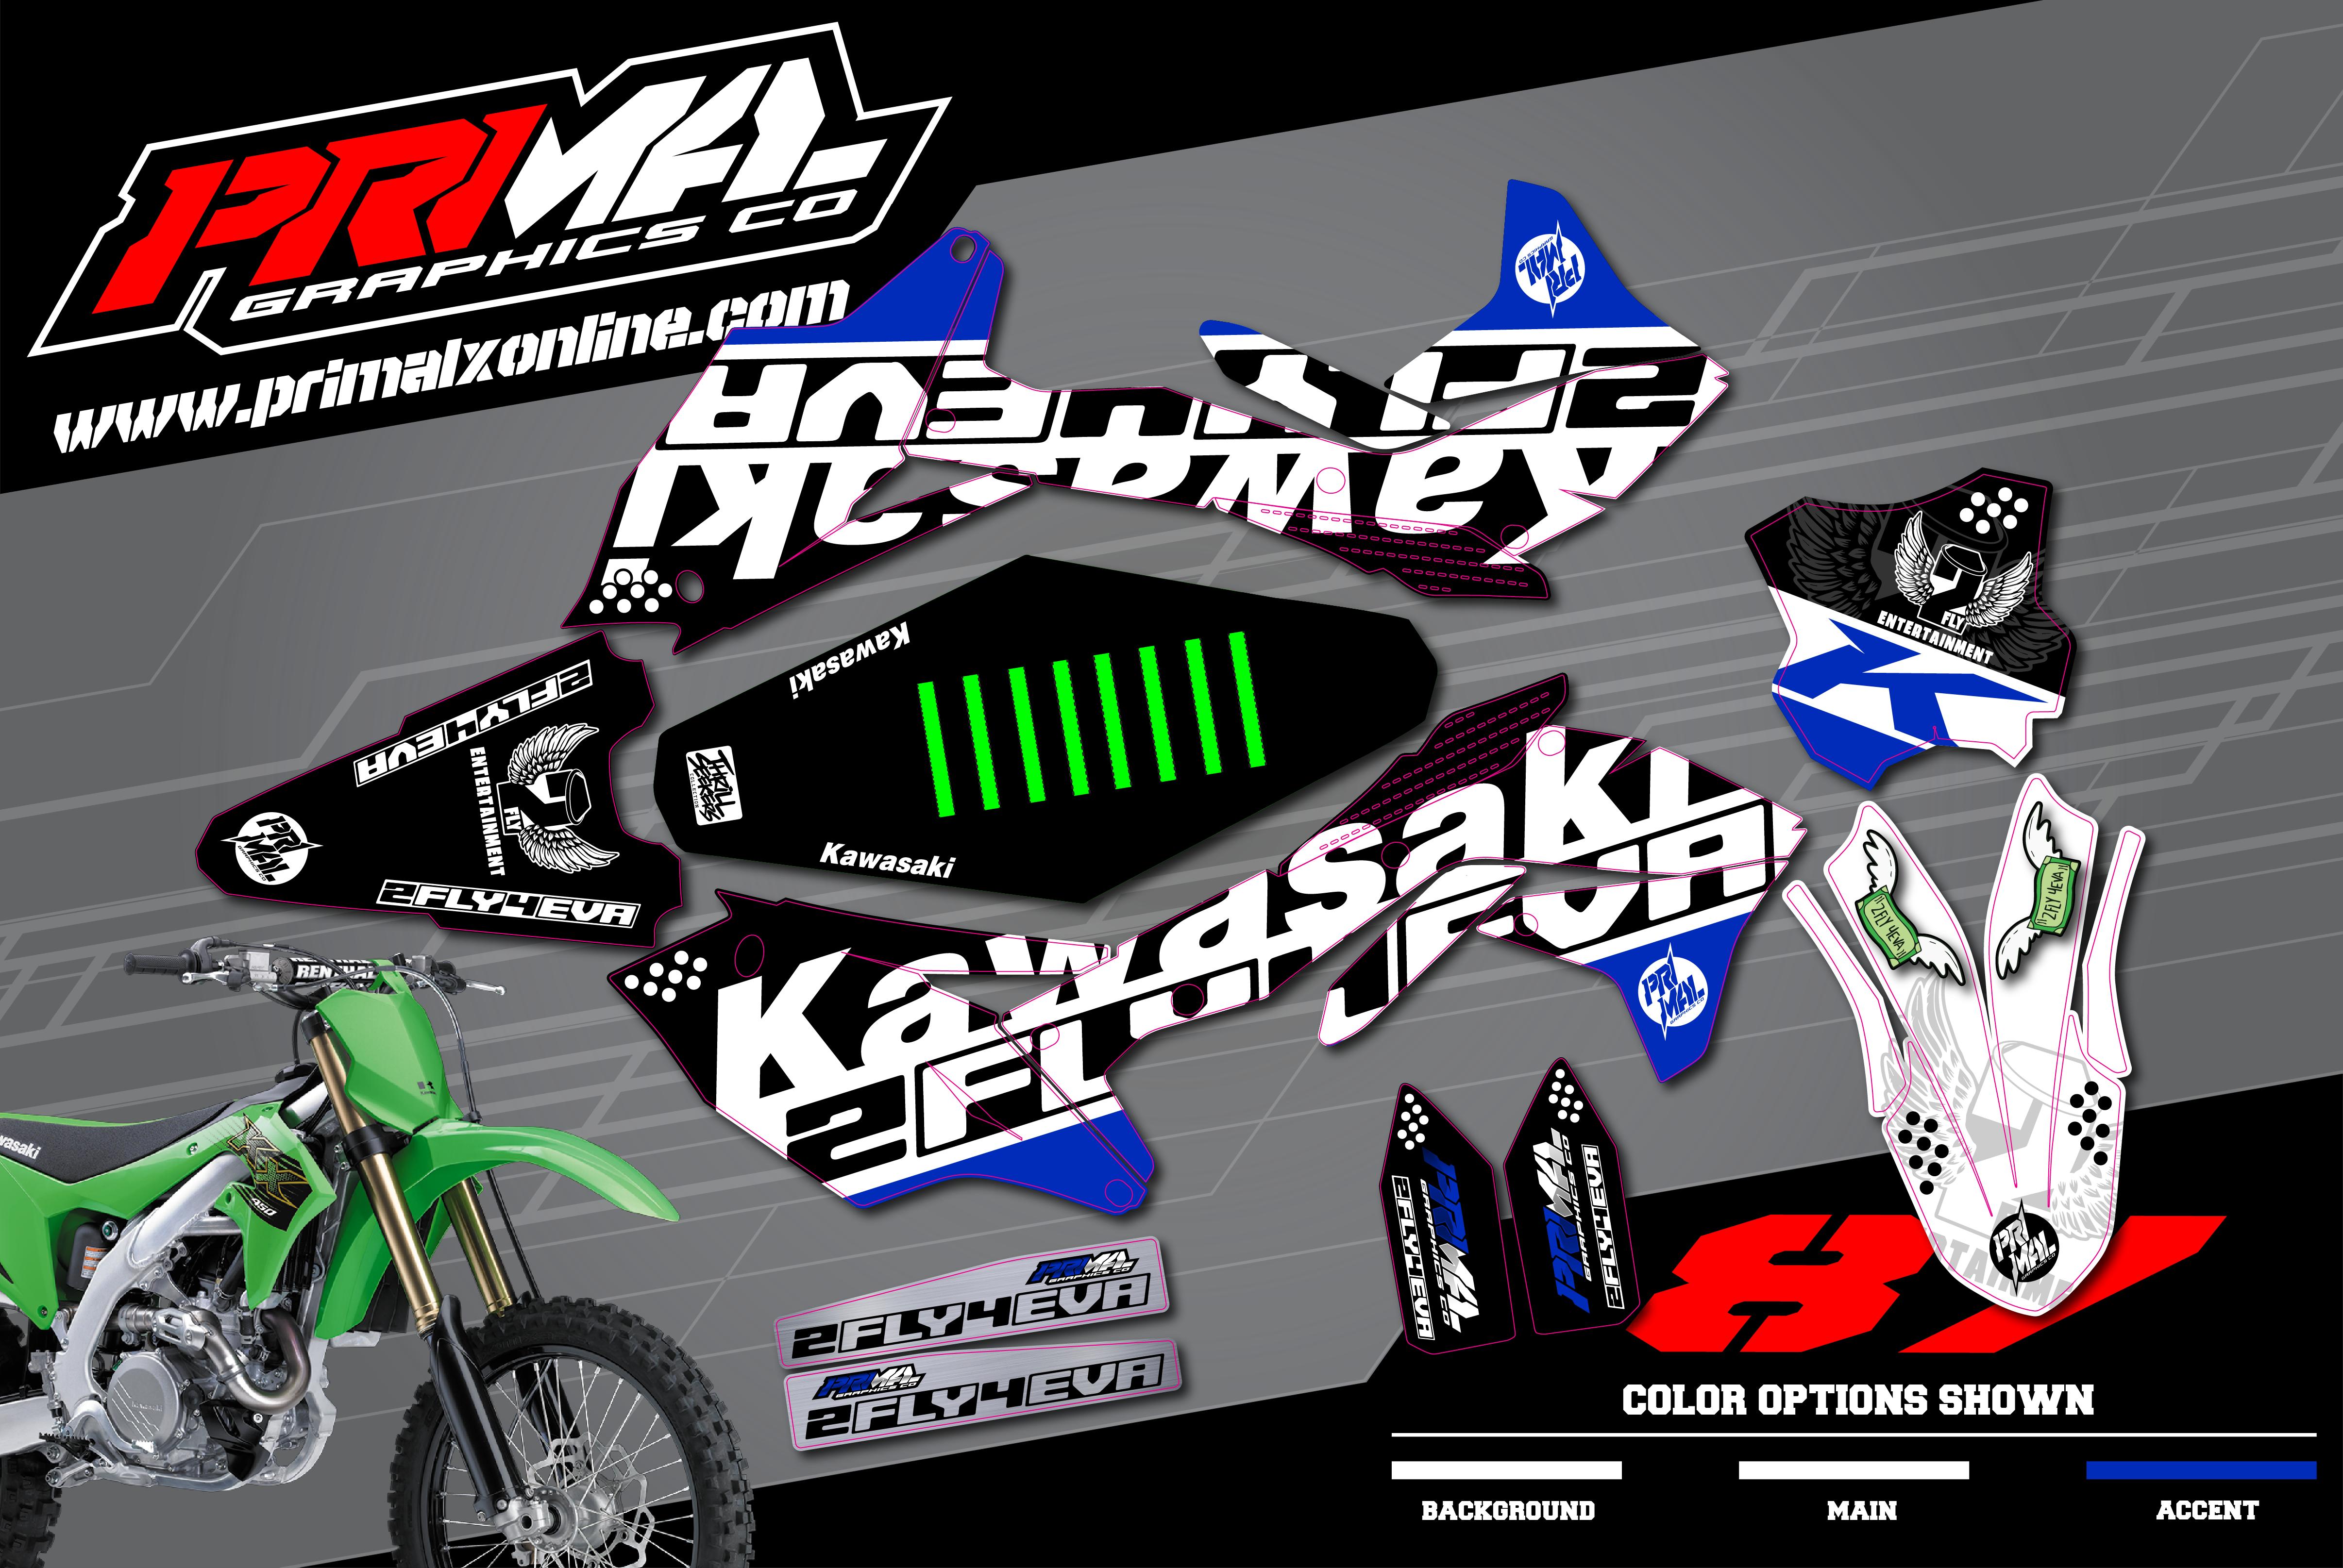 PRIMAL-X-MOTORSPORTS-PRIMAL-GRAPHICS-CO-KAWASAKI-KX450F-KX250-KX250F-MX-GRAPHICS-MOTOCROSS-SUPERMOTO-MOTOCROSS-GRAPHICS-BIKELIFE-01